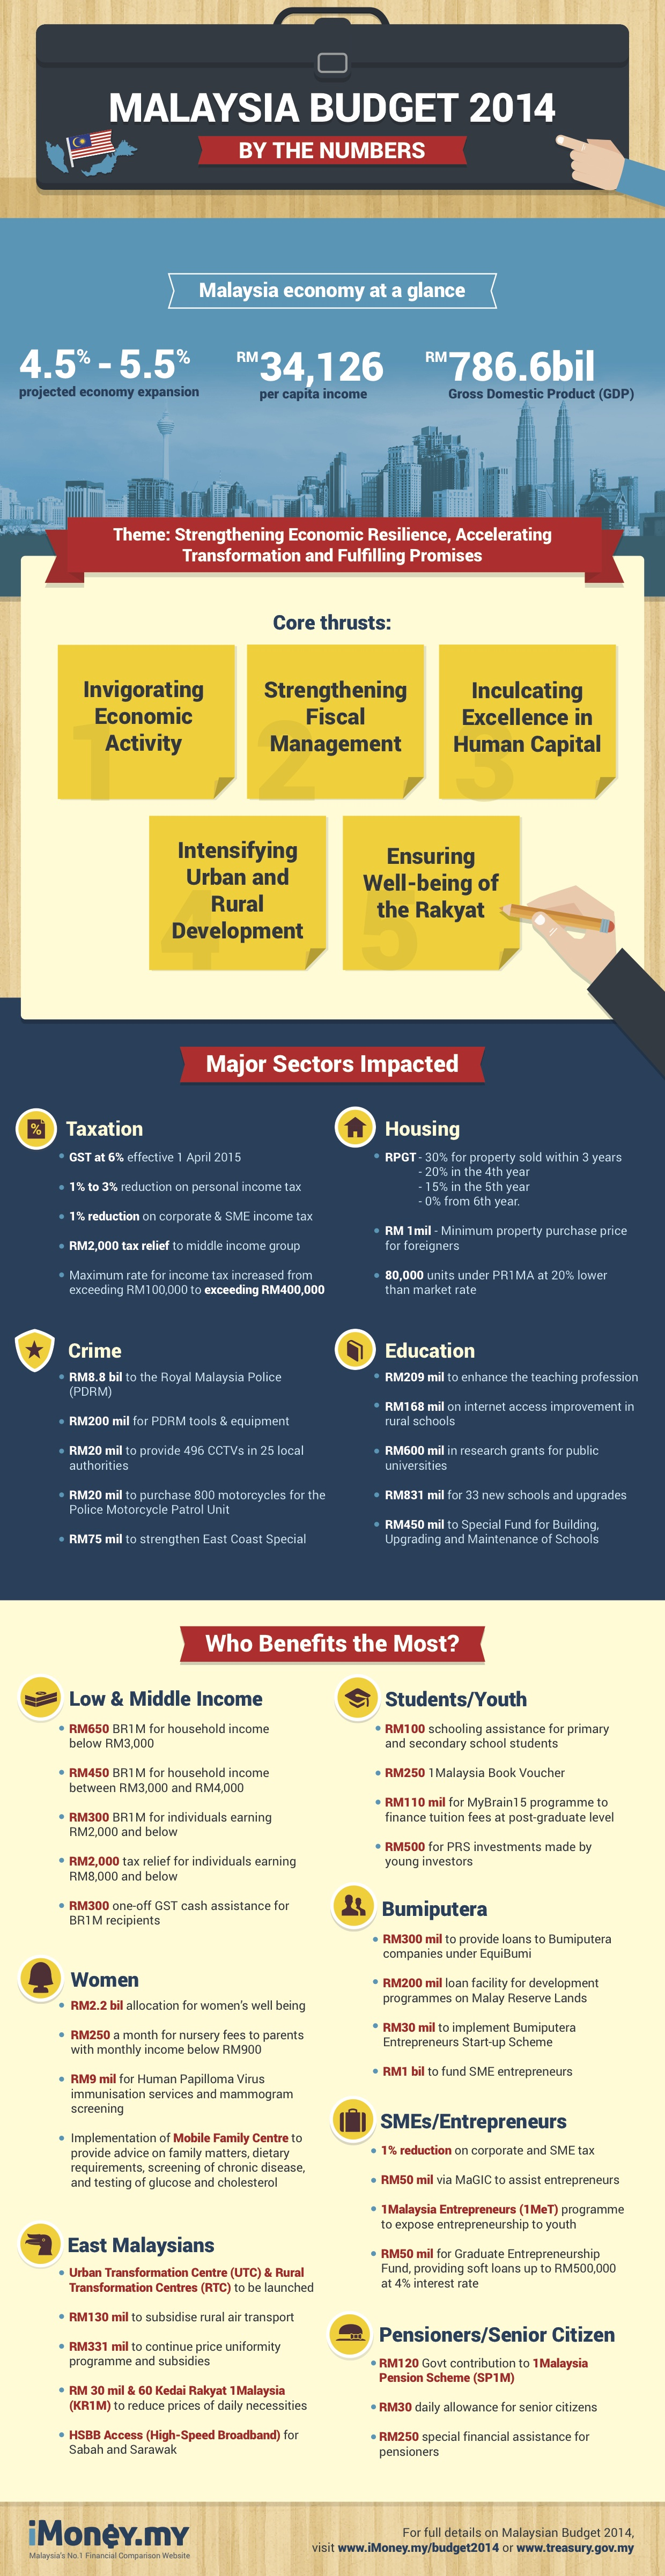 Budget 2014 Malaysia